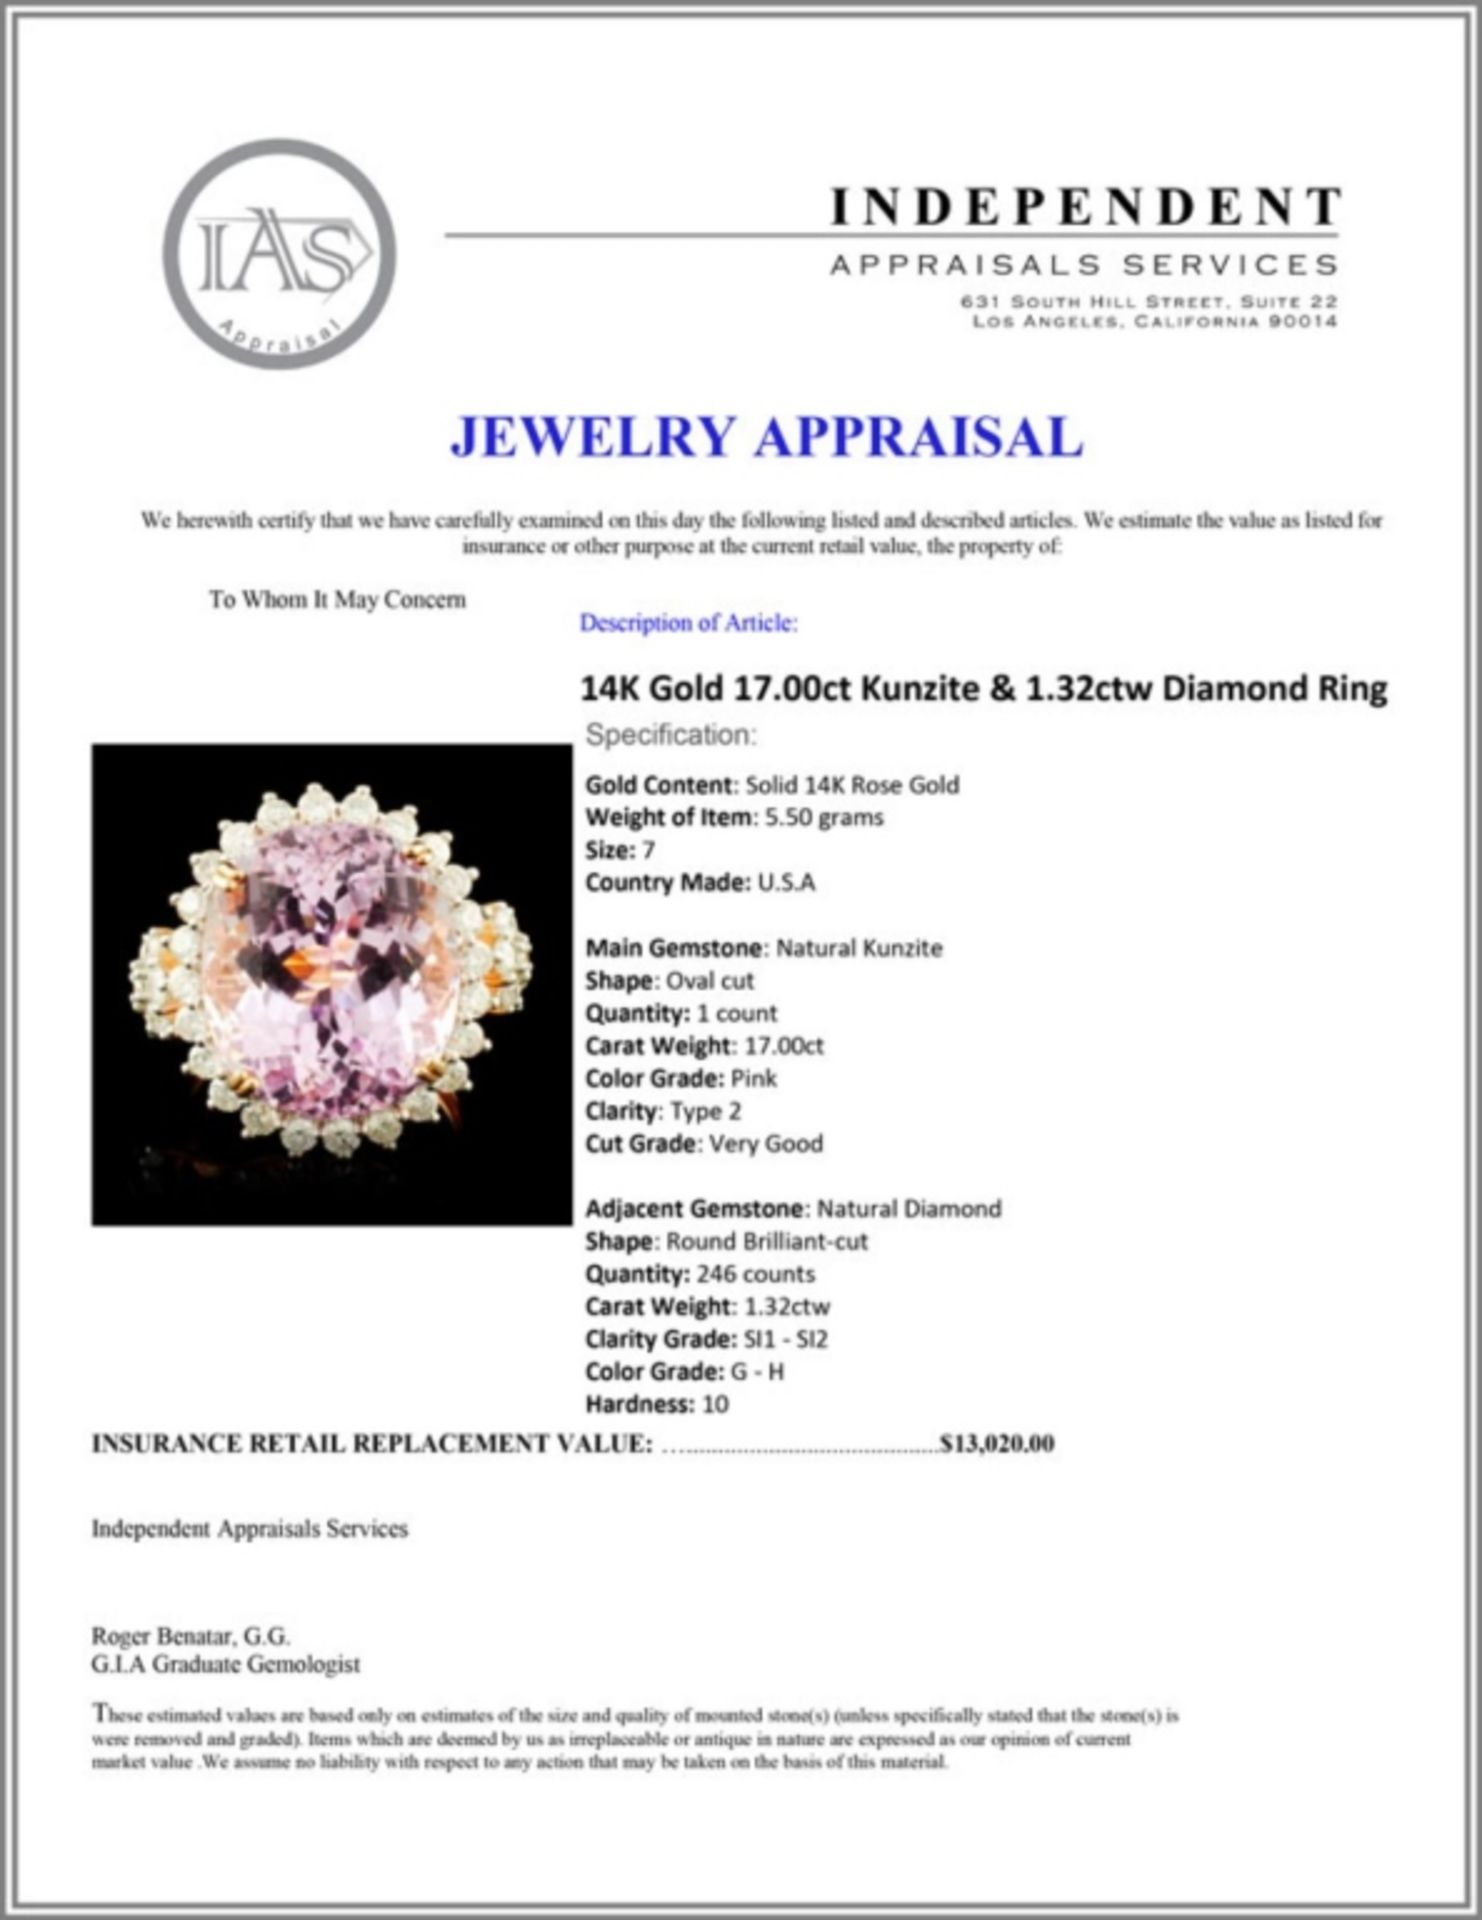 14K Gold 17.00ct Kunzite & 1.32ctw Diamond Ring - Image 5 of 5